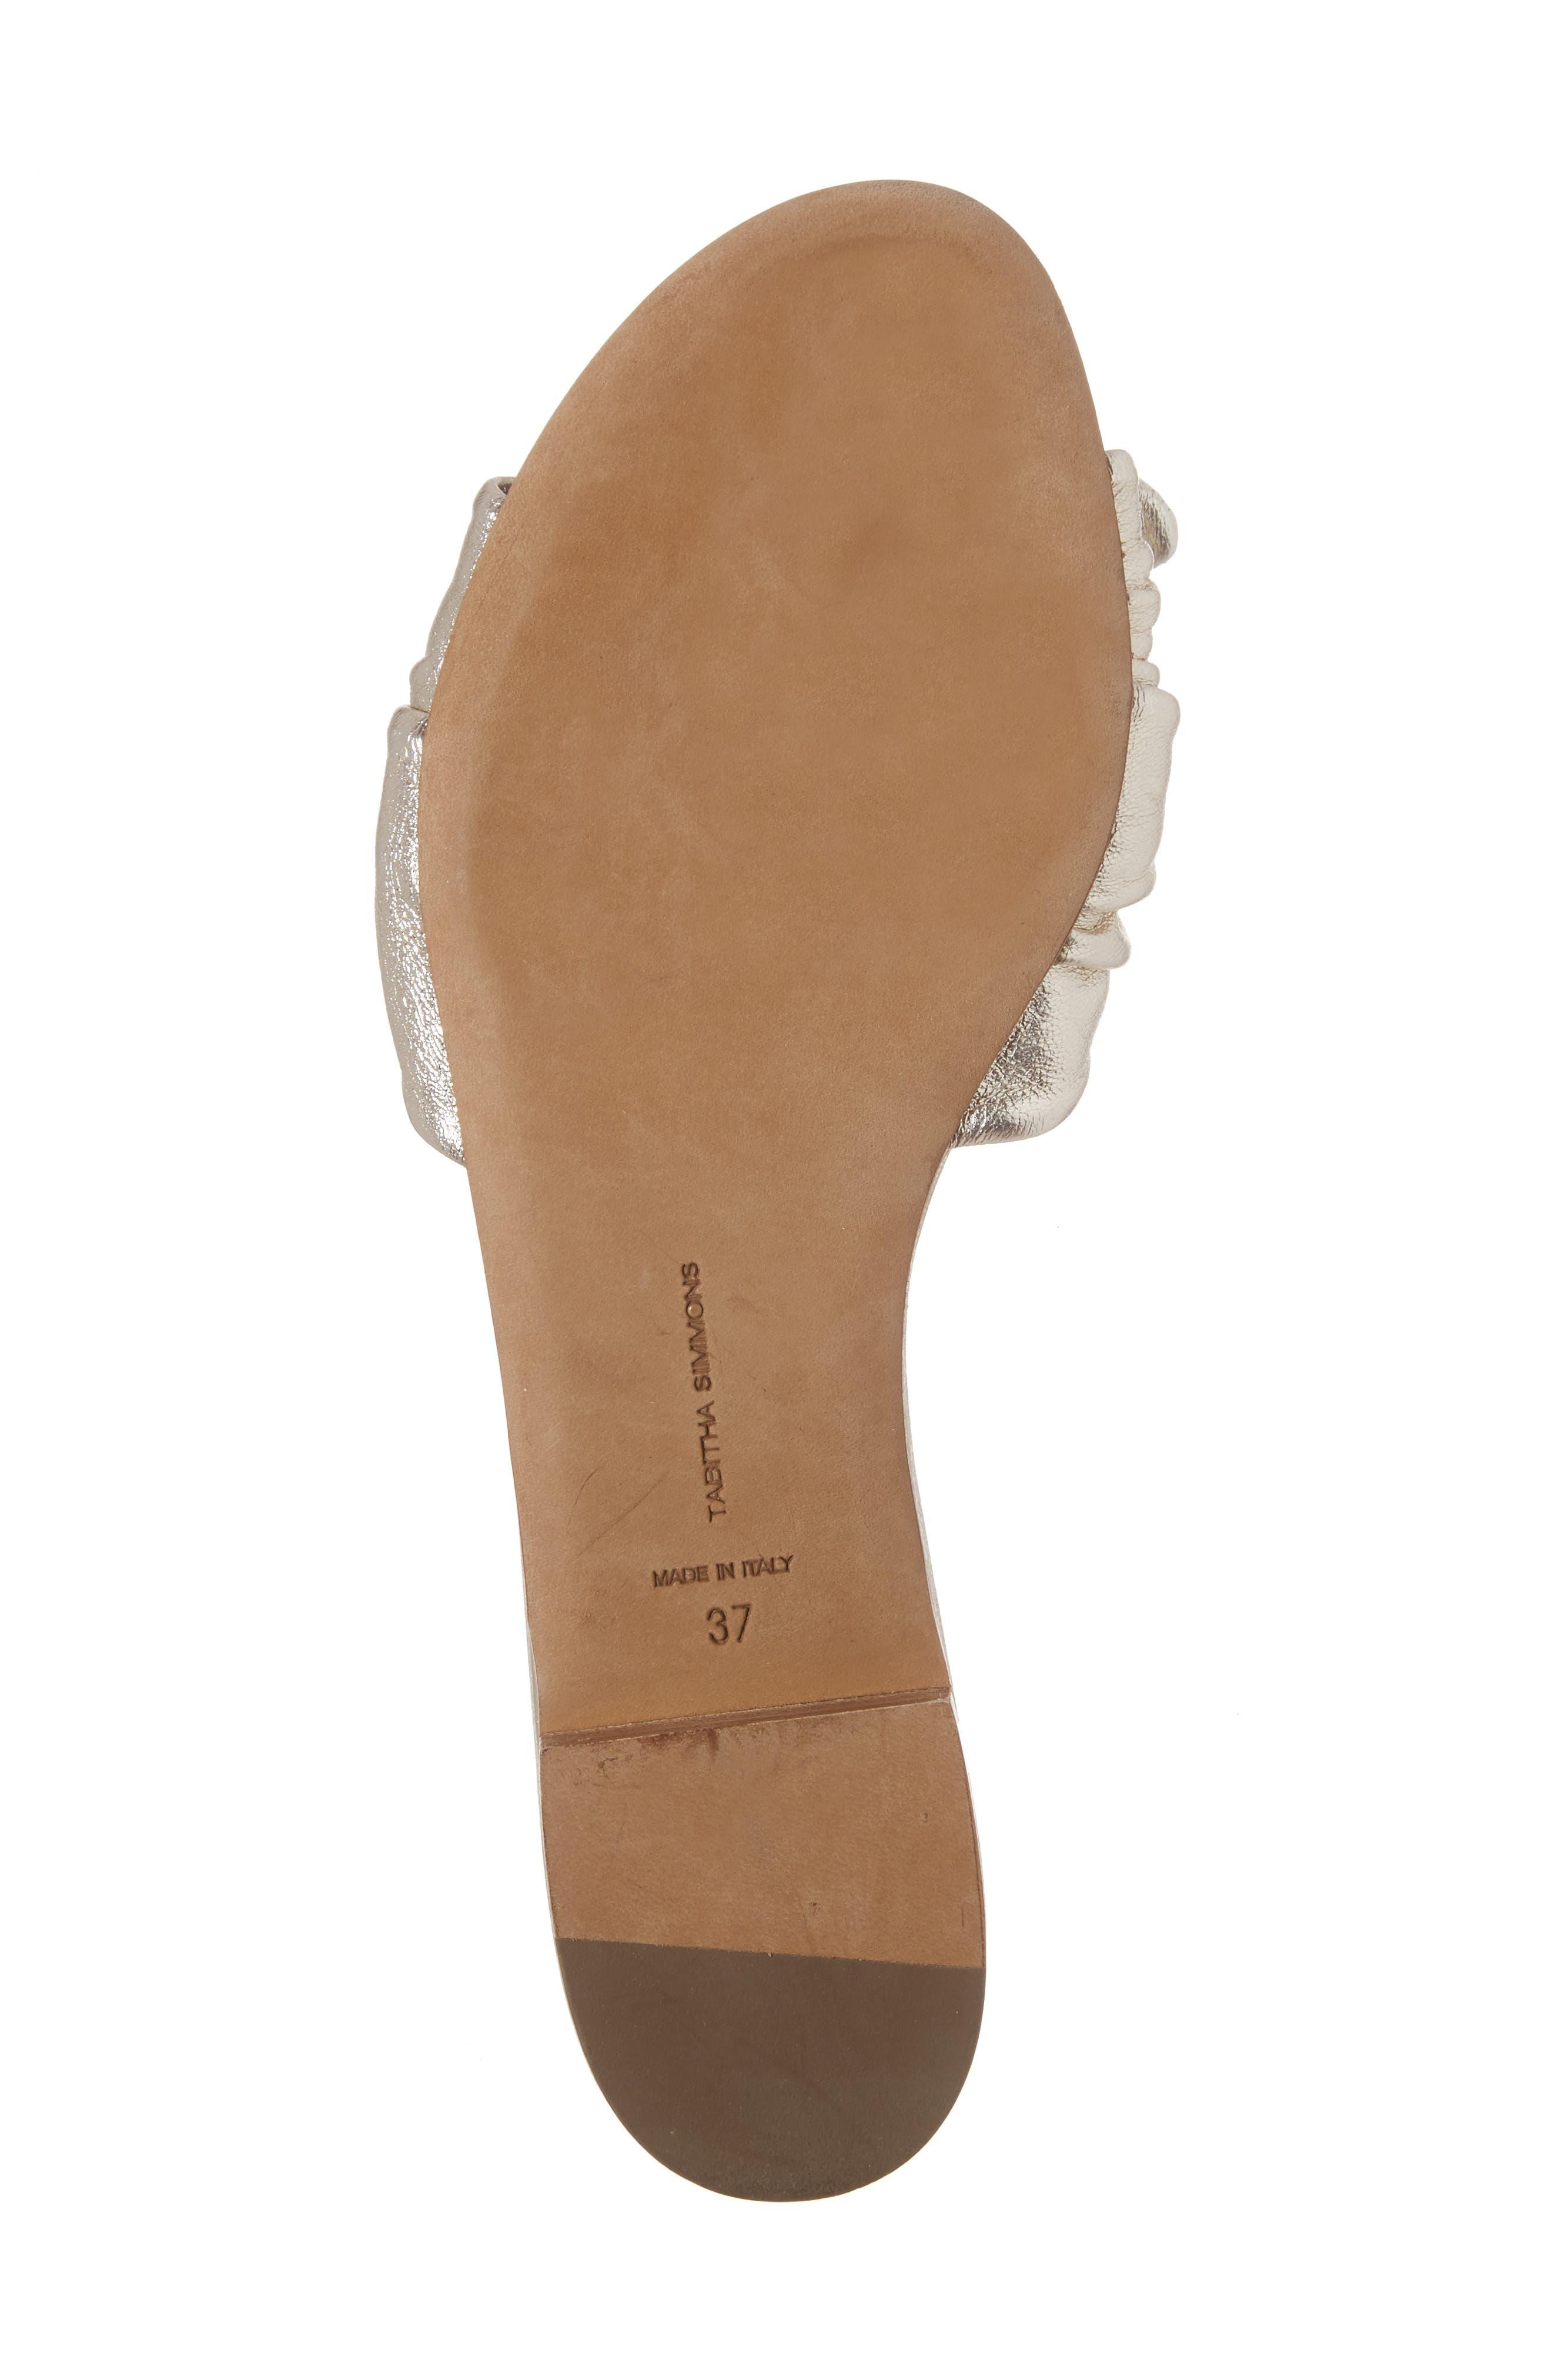 Cleo Knotted Bow Slide Sandal,                             Alternate thumbnail 6, color,                             040